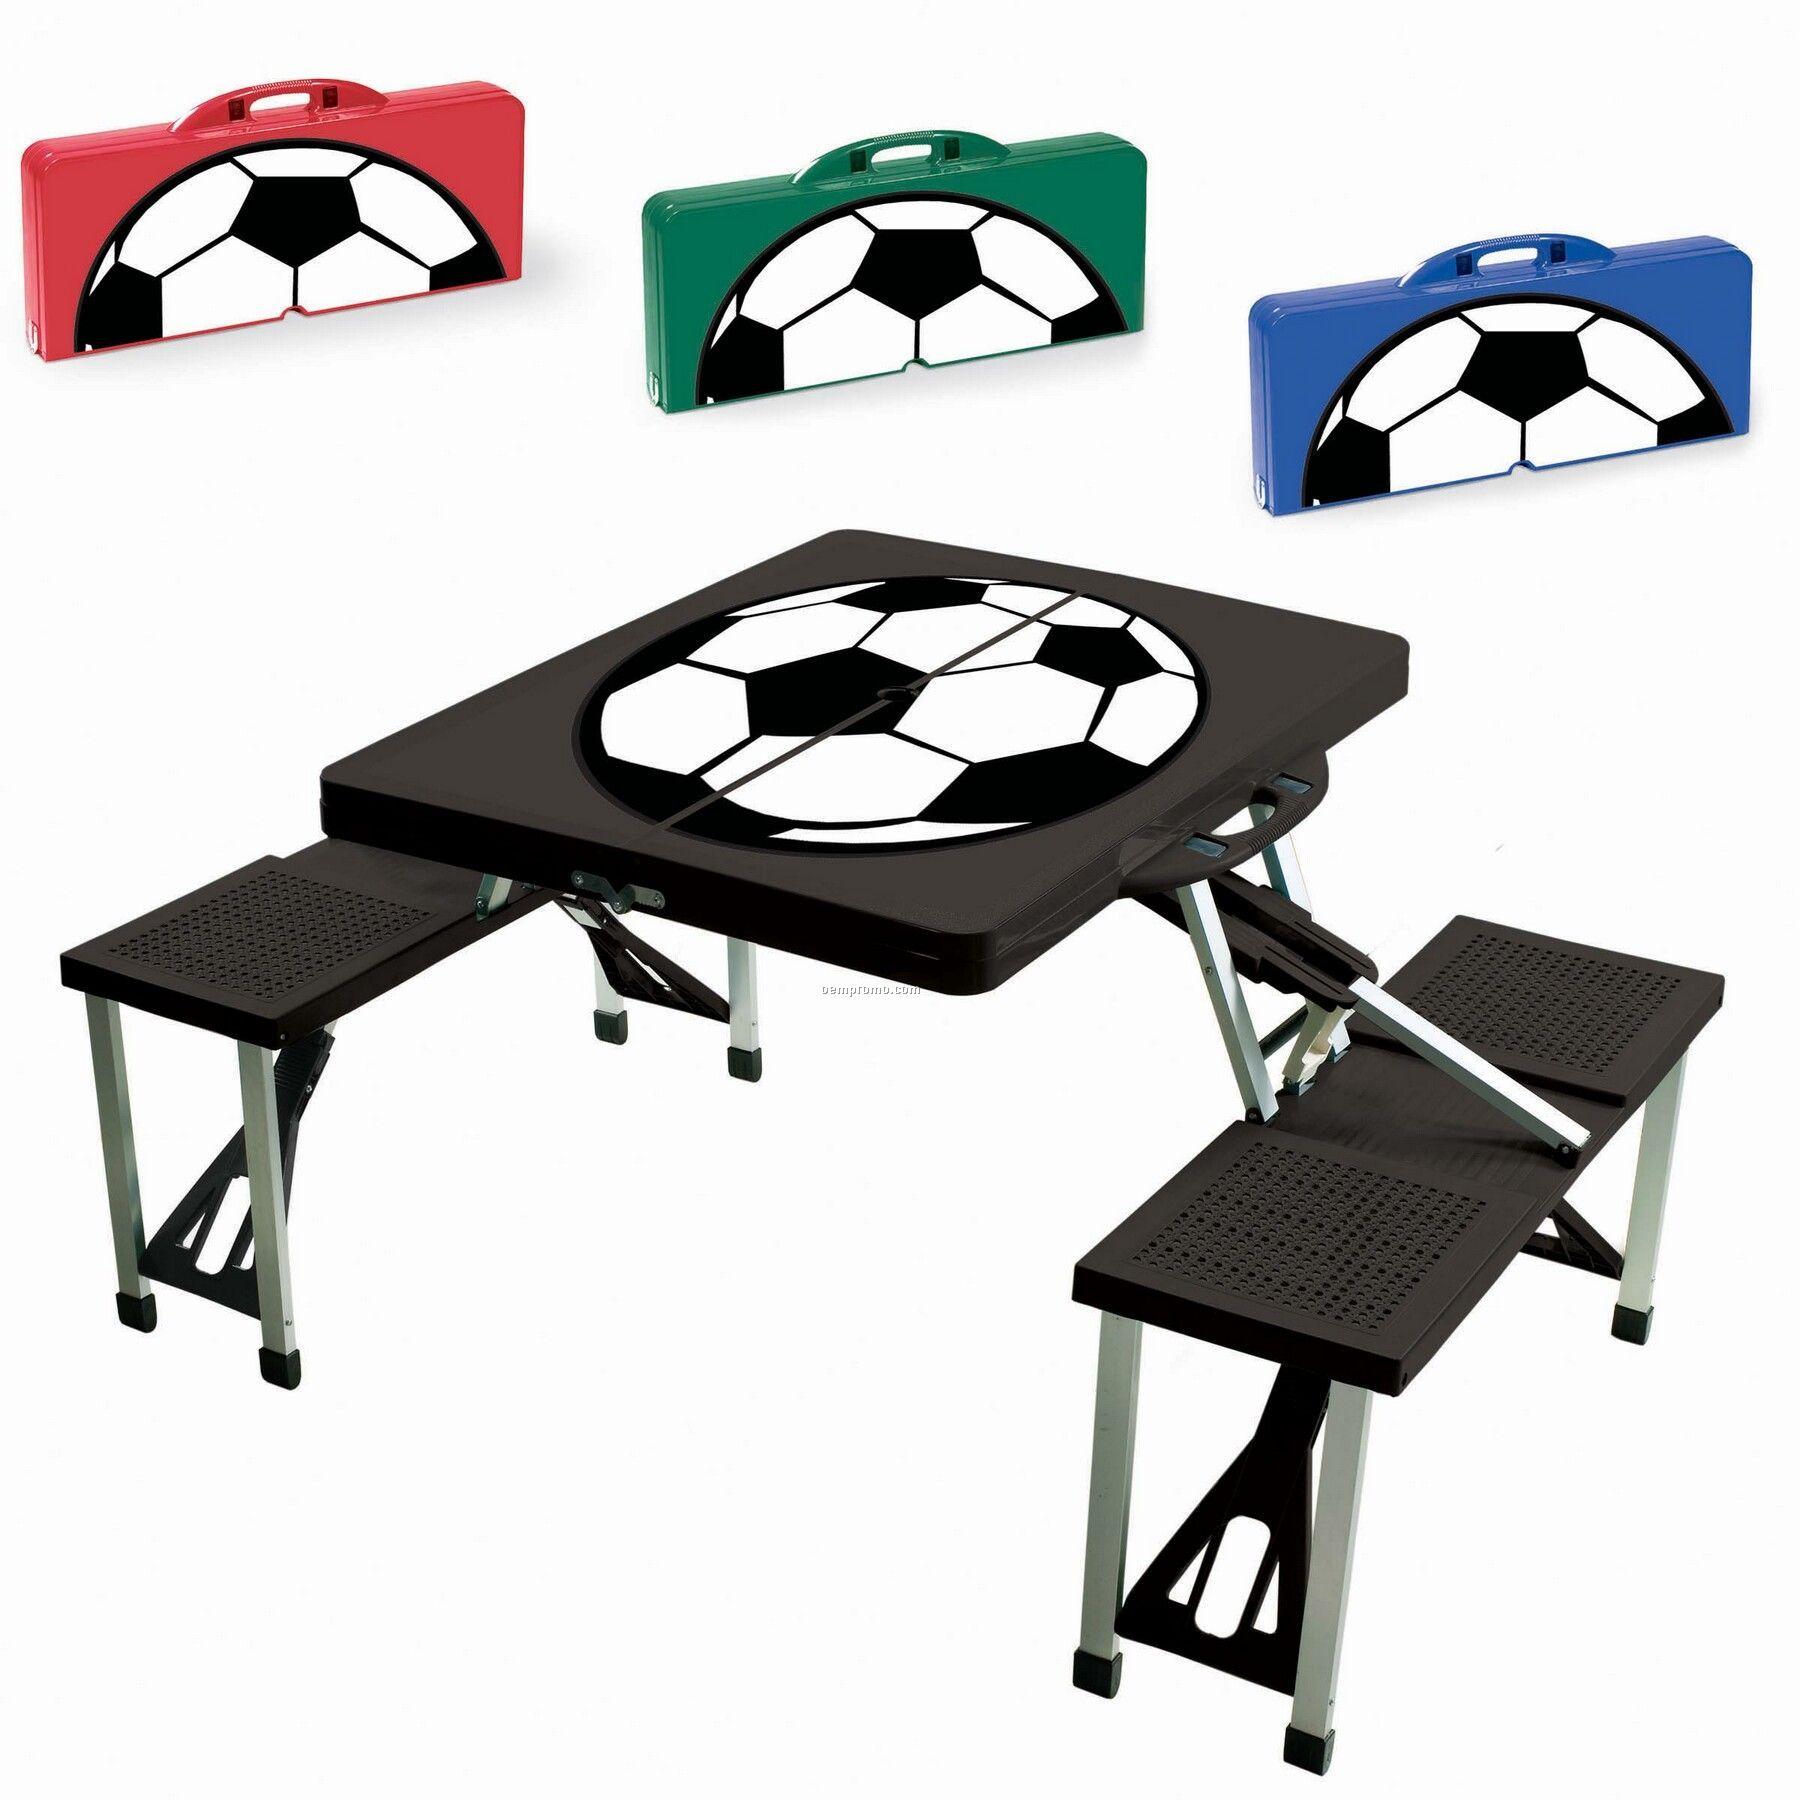 Stunning Folding Picnic Table with Seats 1800 x 1800 · 213 kB · jpeg